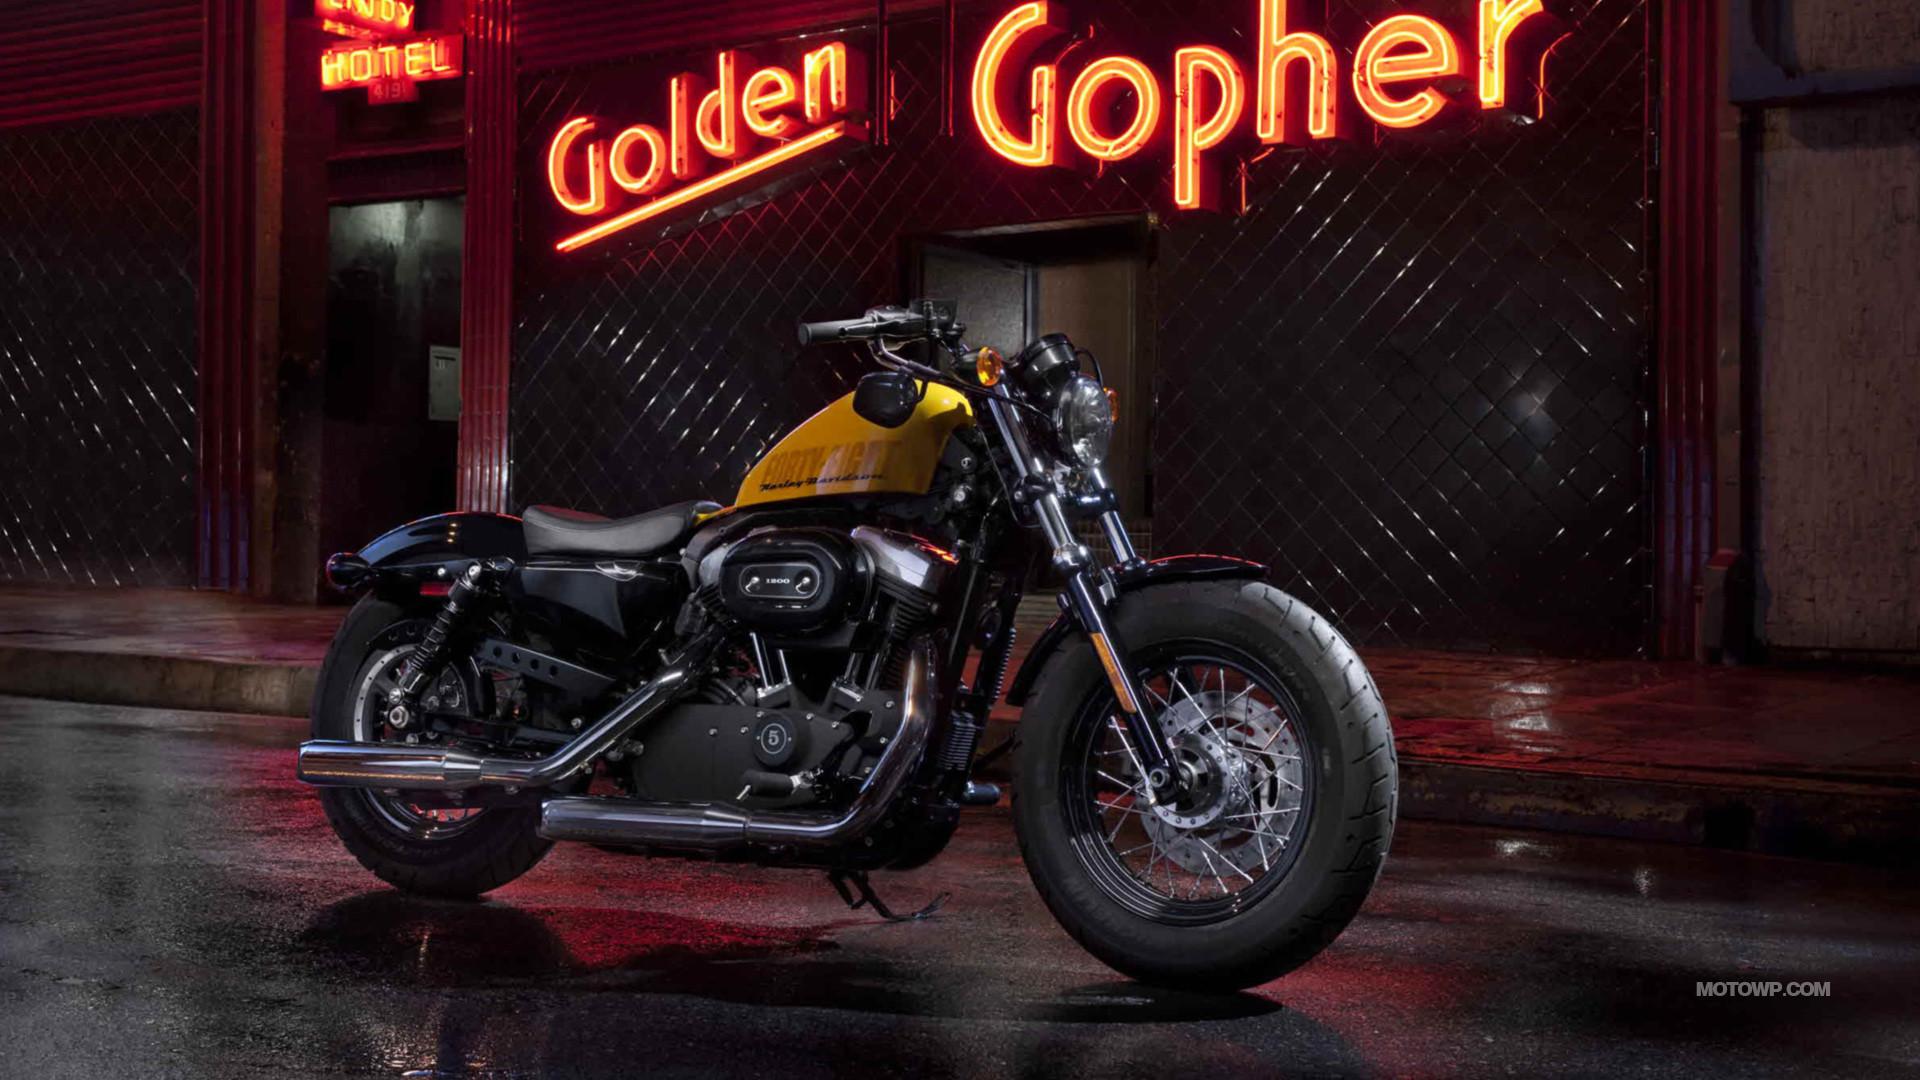 Harley Davidson Forty Eight Hd Wallpaper Harley Davidson Wallpaper Hd 74 Images